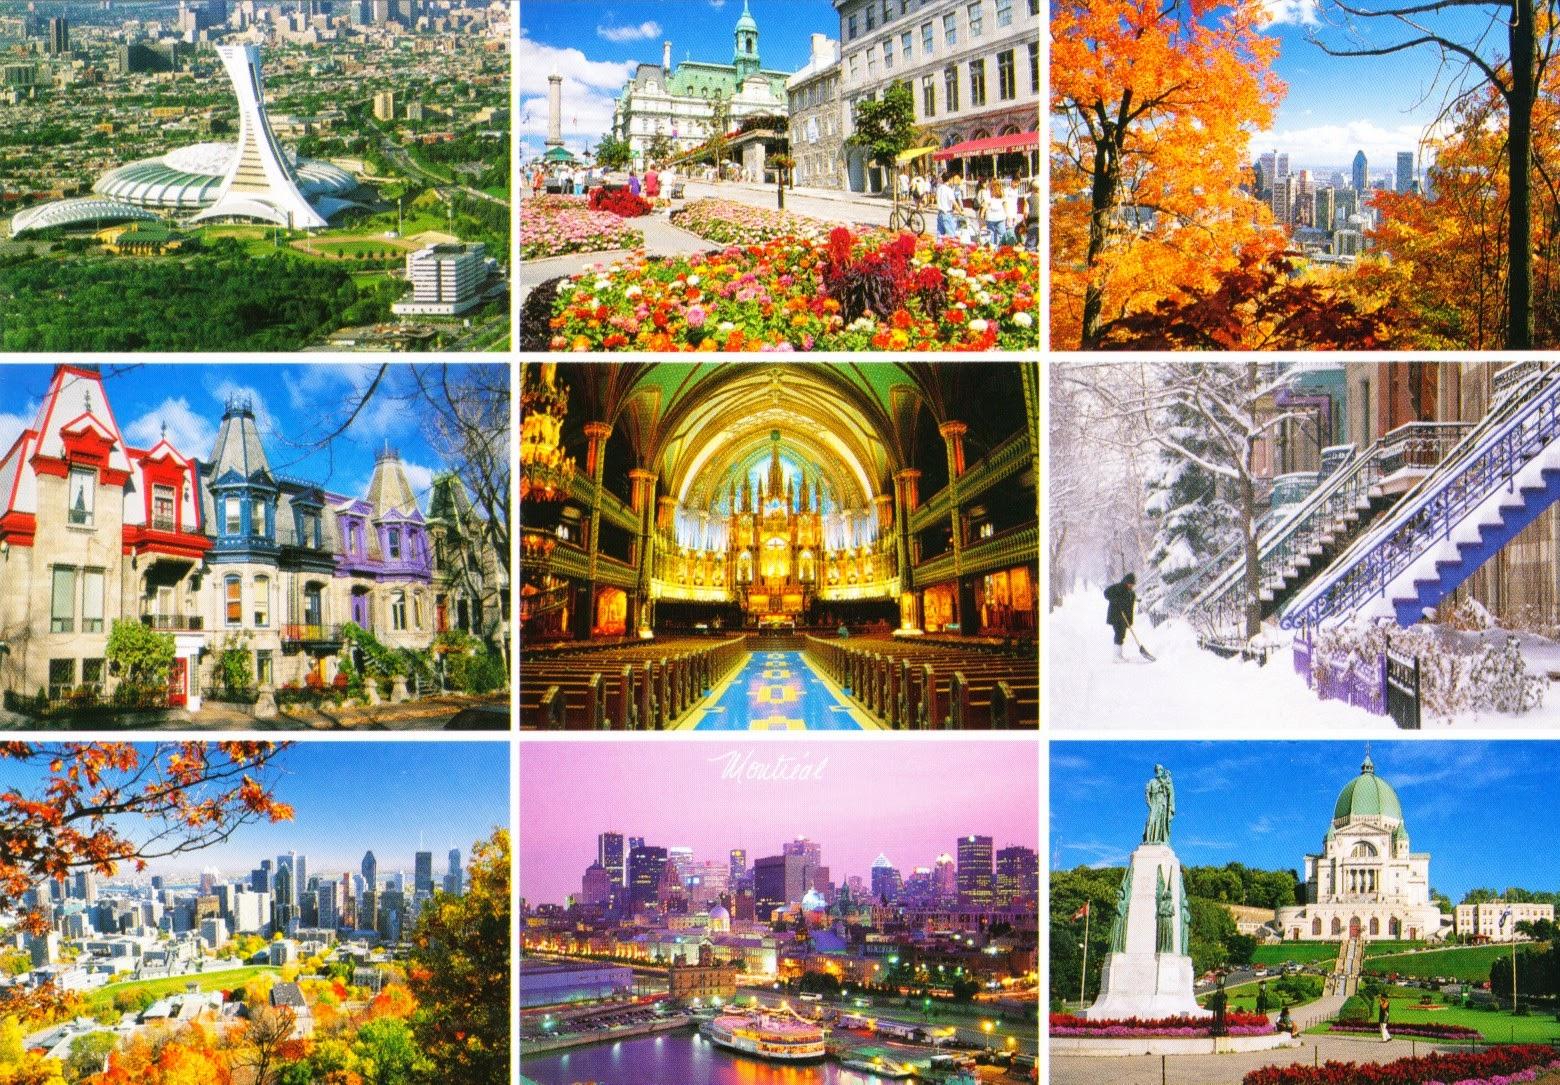 montréal, postcard, olympic stadium, notre-dame basilica, st. joseph's orator, old port